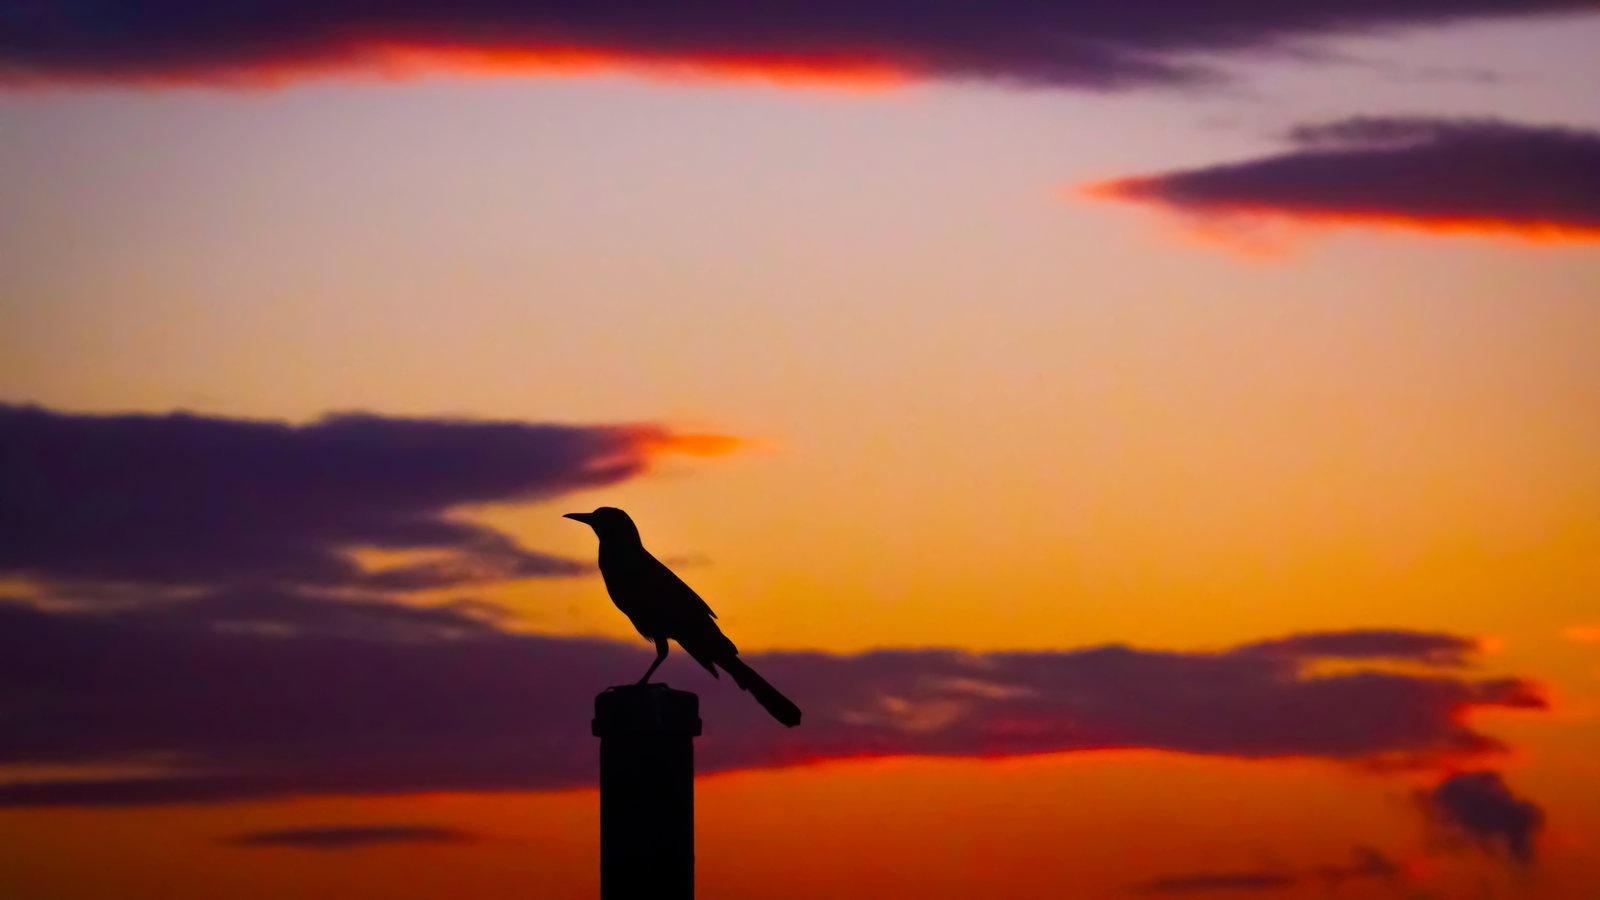 Raven Dusk by David Lustrup